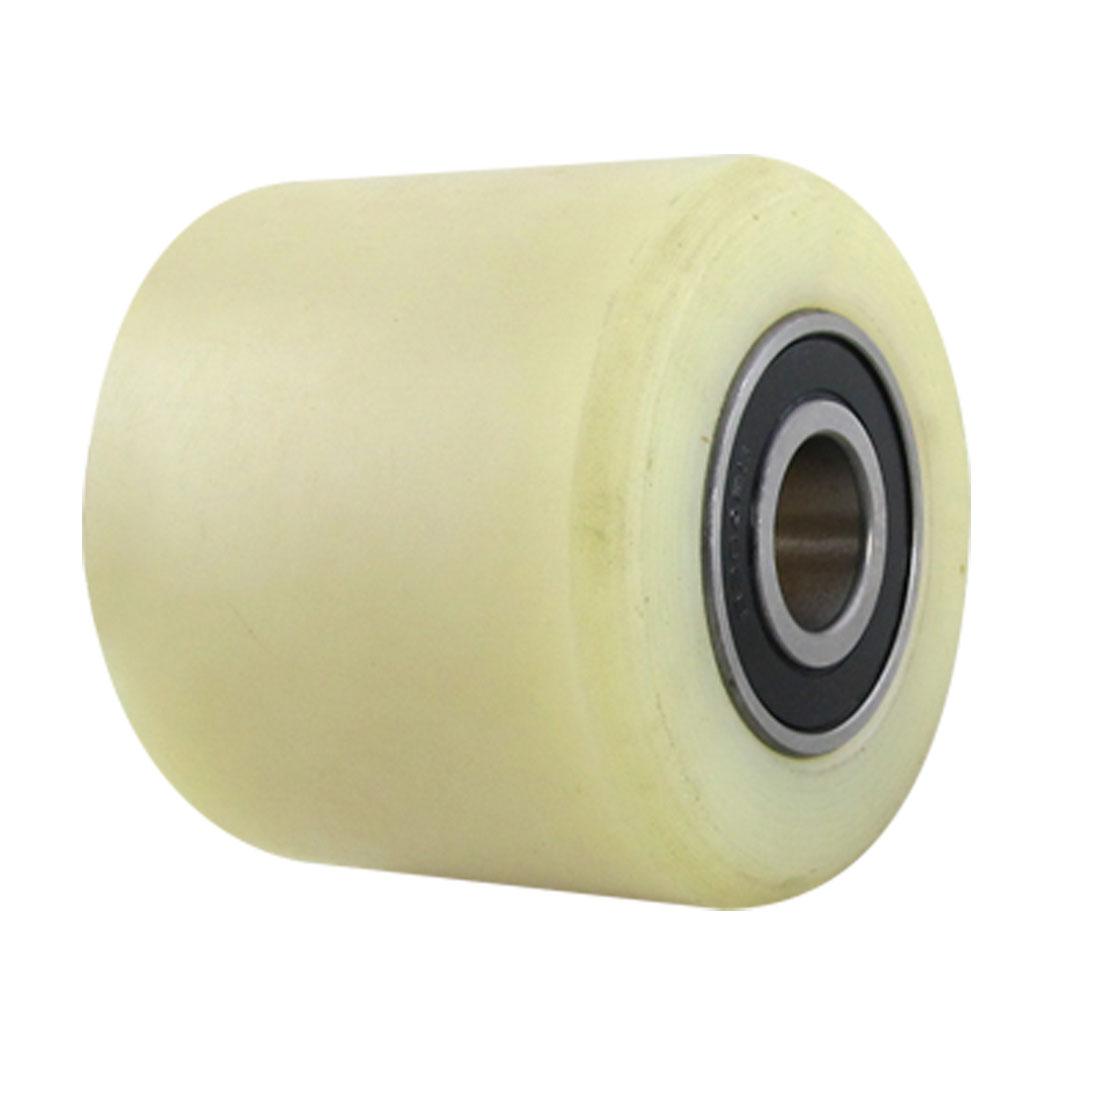 Replacement 80mm Diameter 70mm Length Nylon Wheel Beige for Pallet Truck